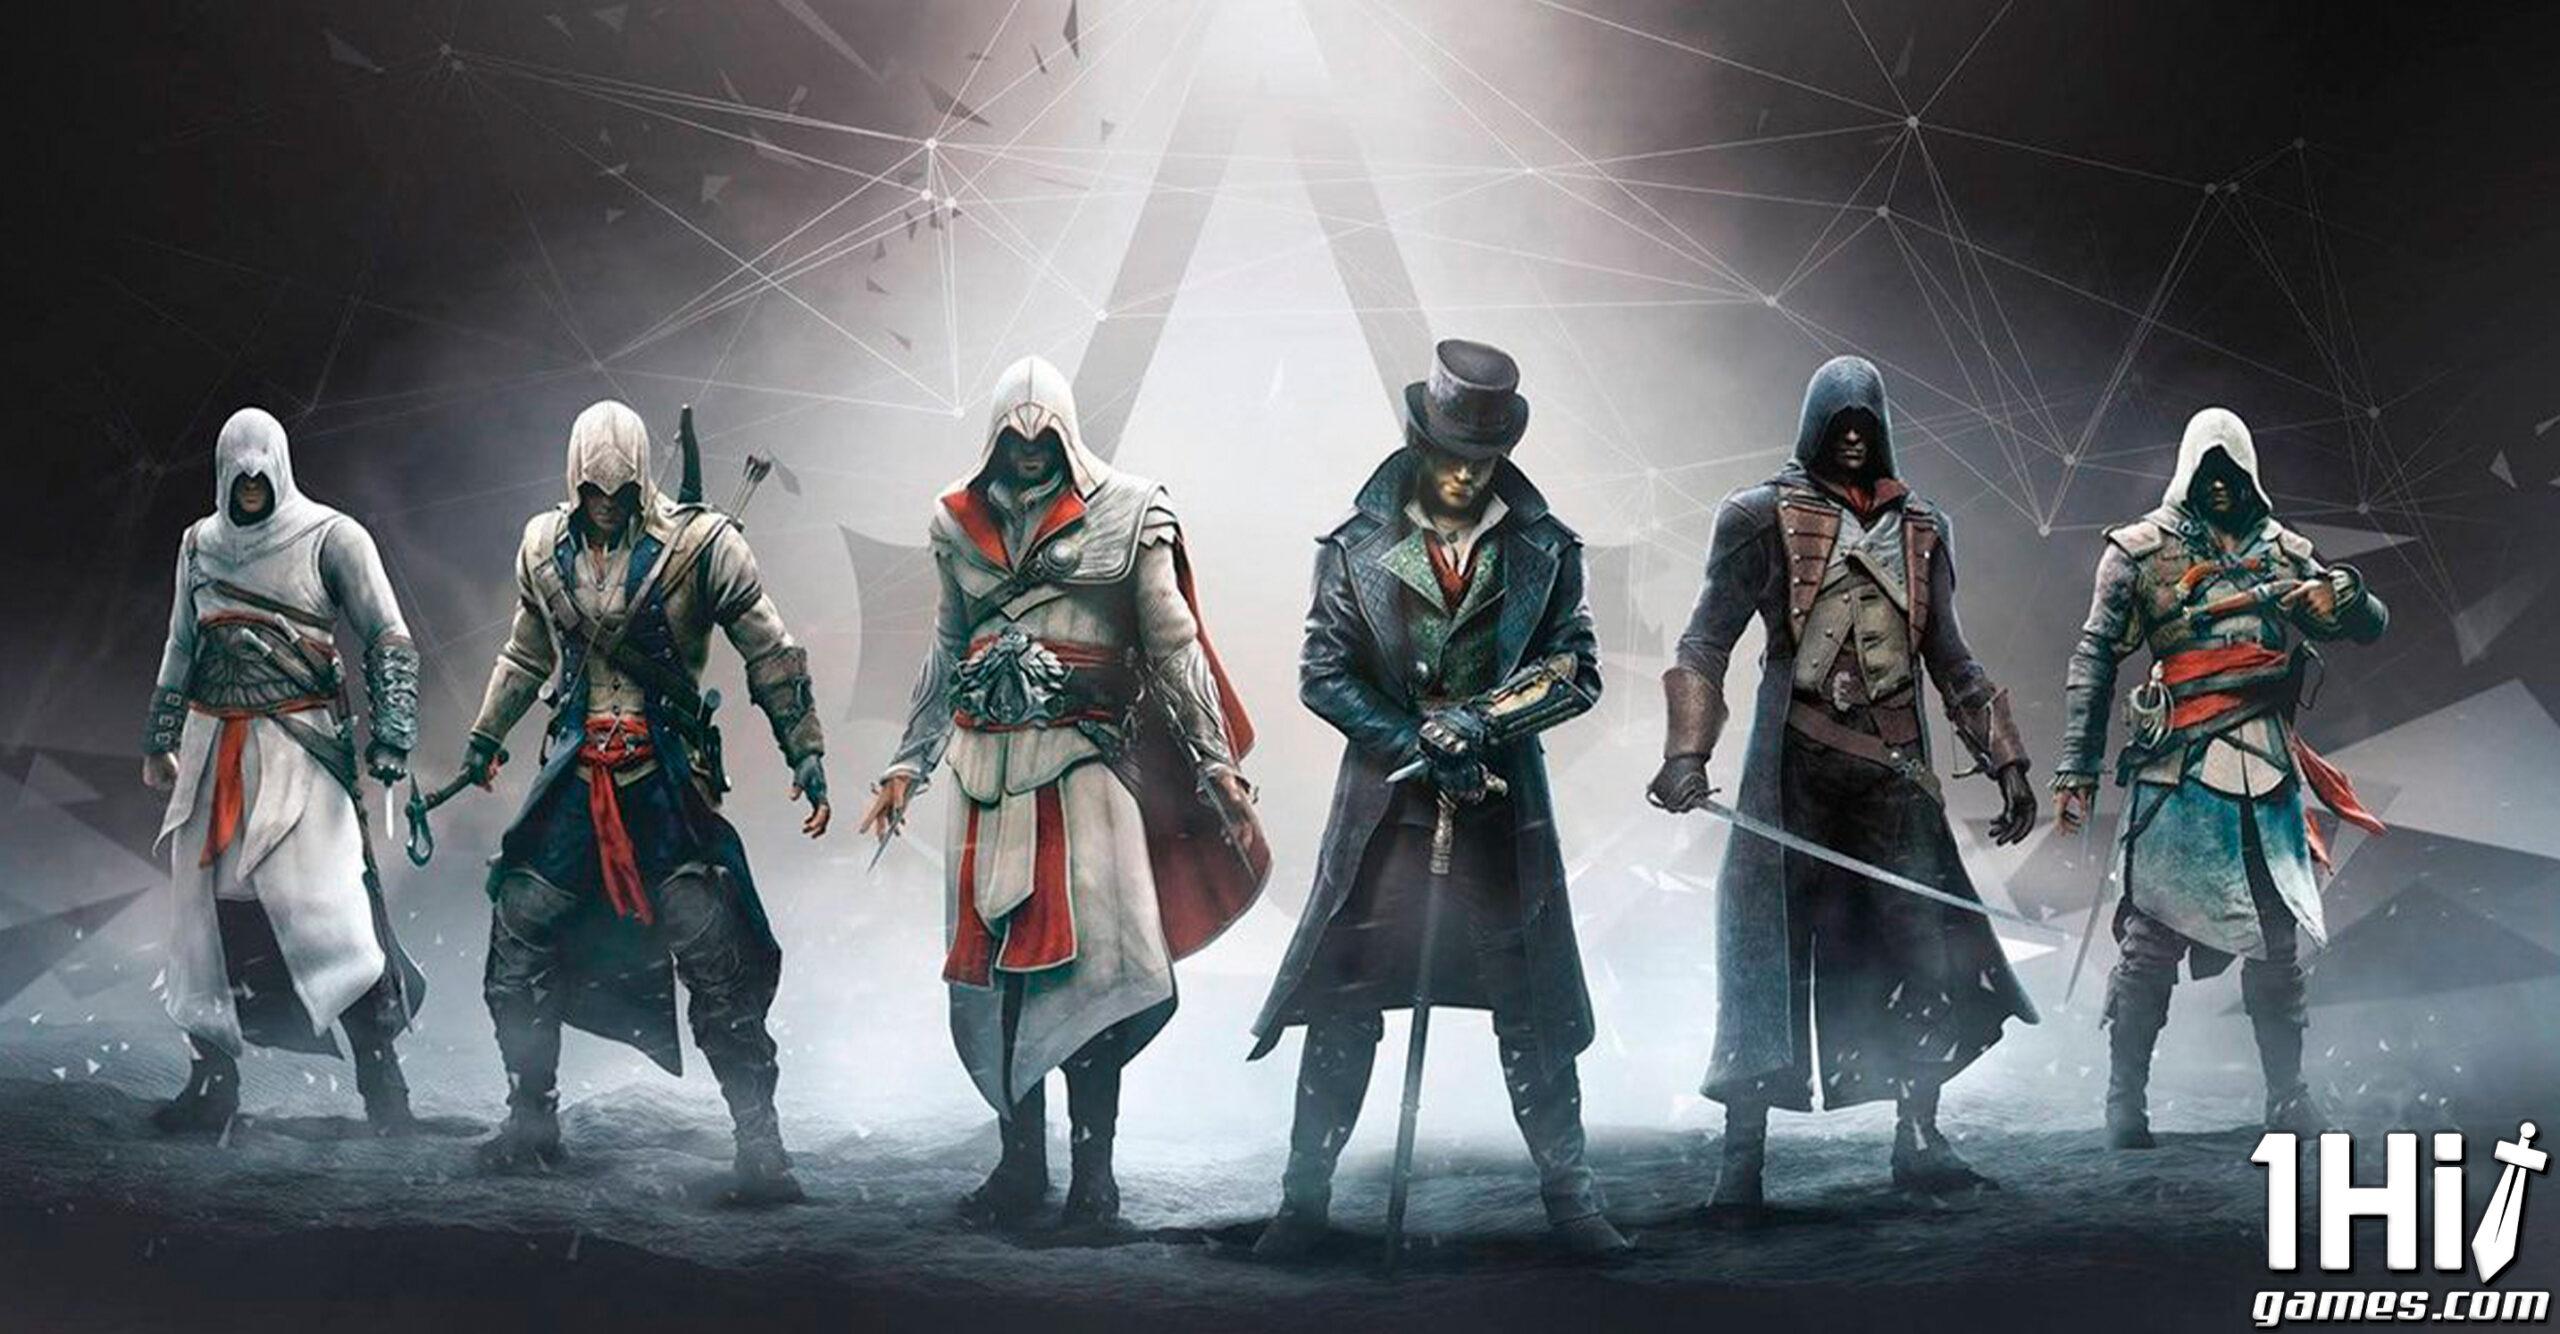 Próximo 'Assassin's Creed' será online